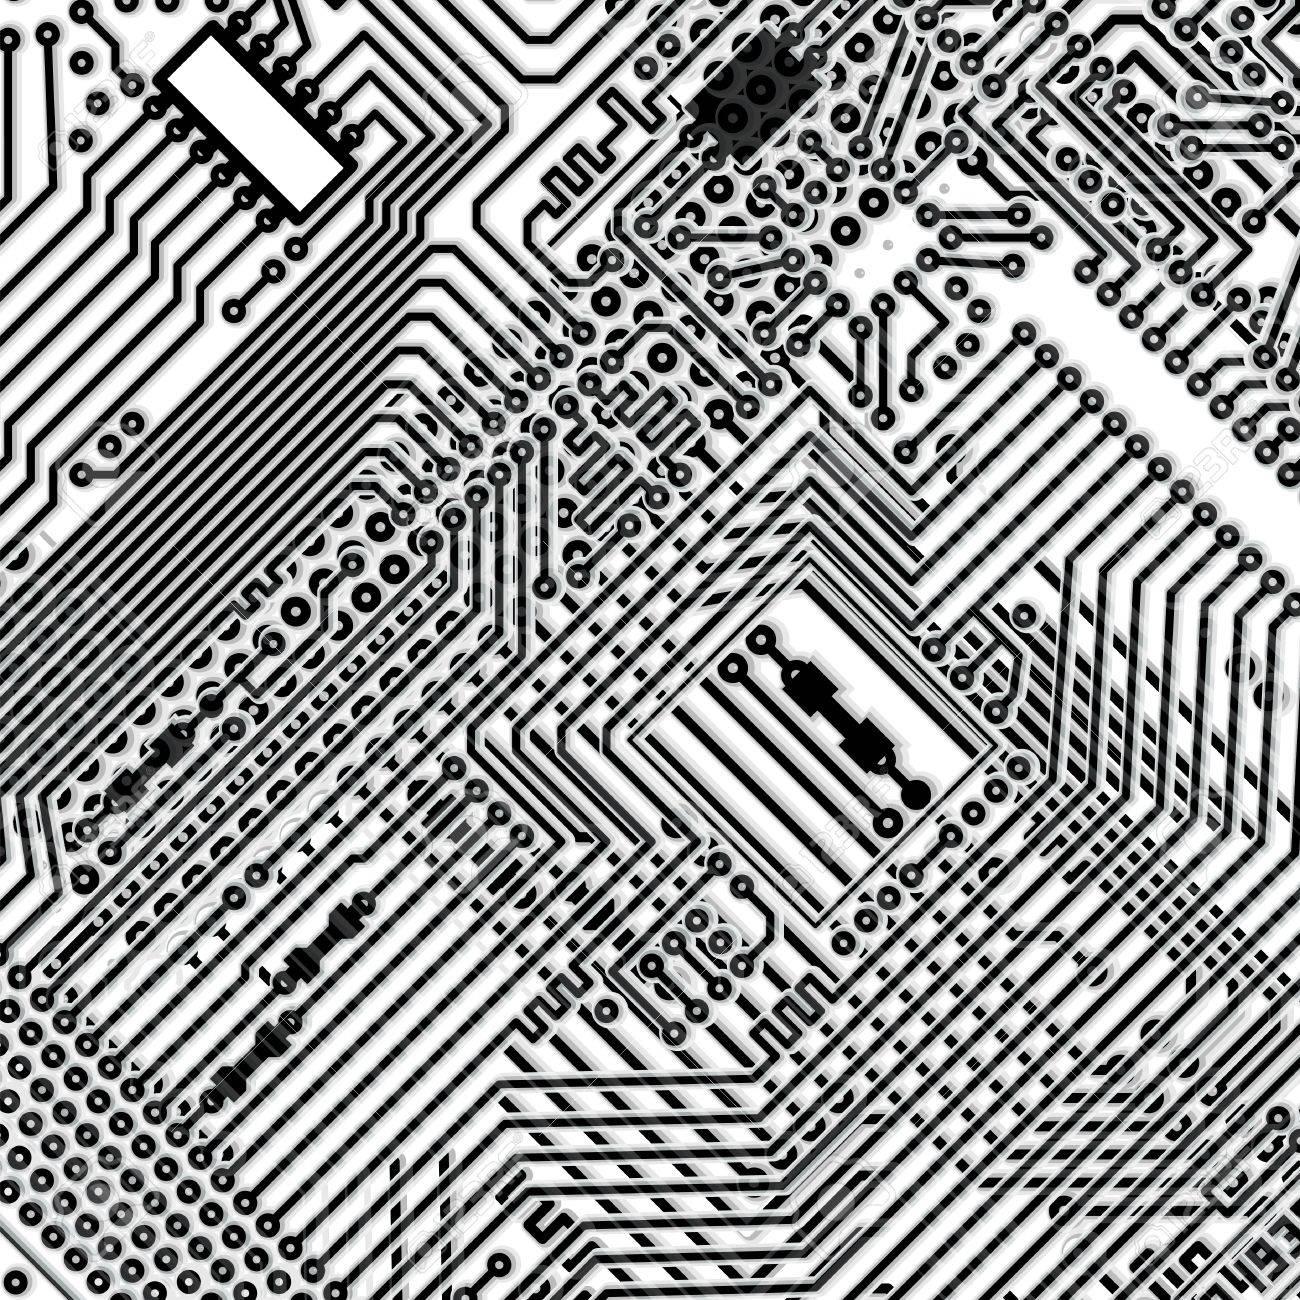 Square monochrome background - design multi-layered electronic circuit board Stock Vector - 10444312